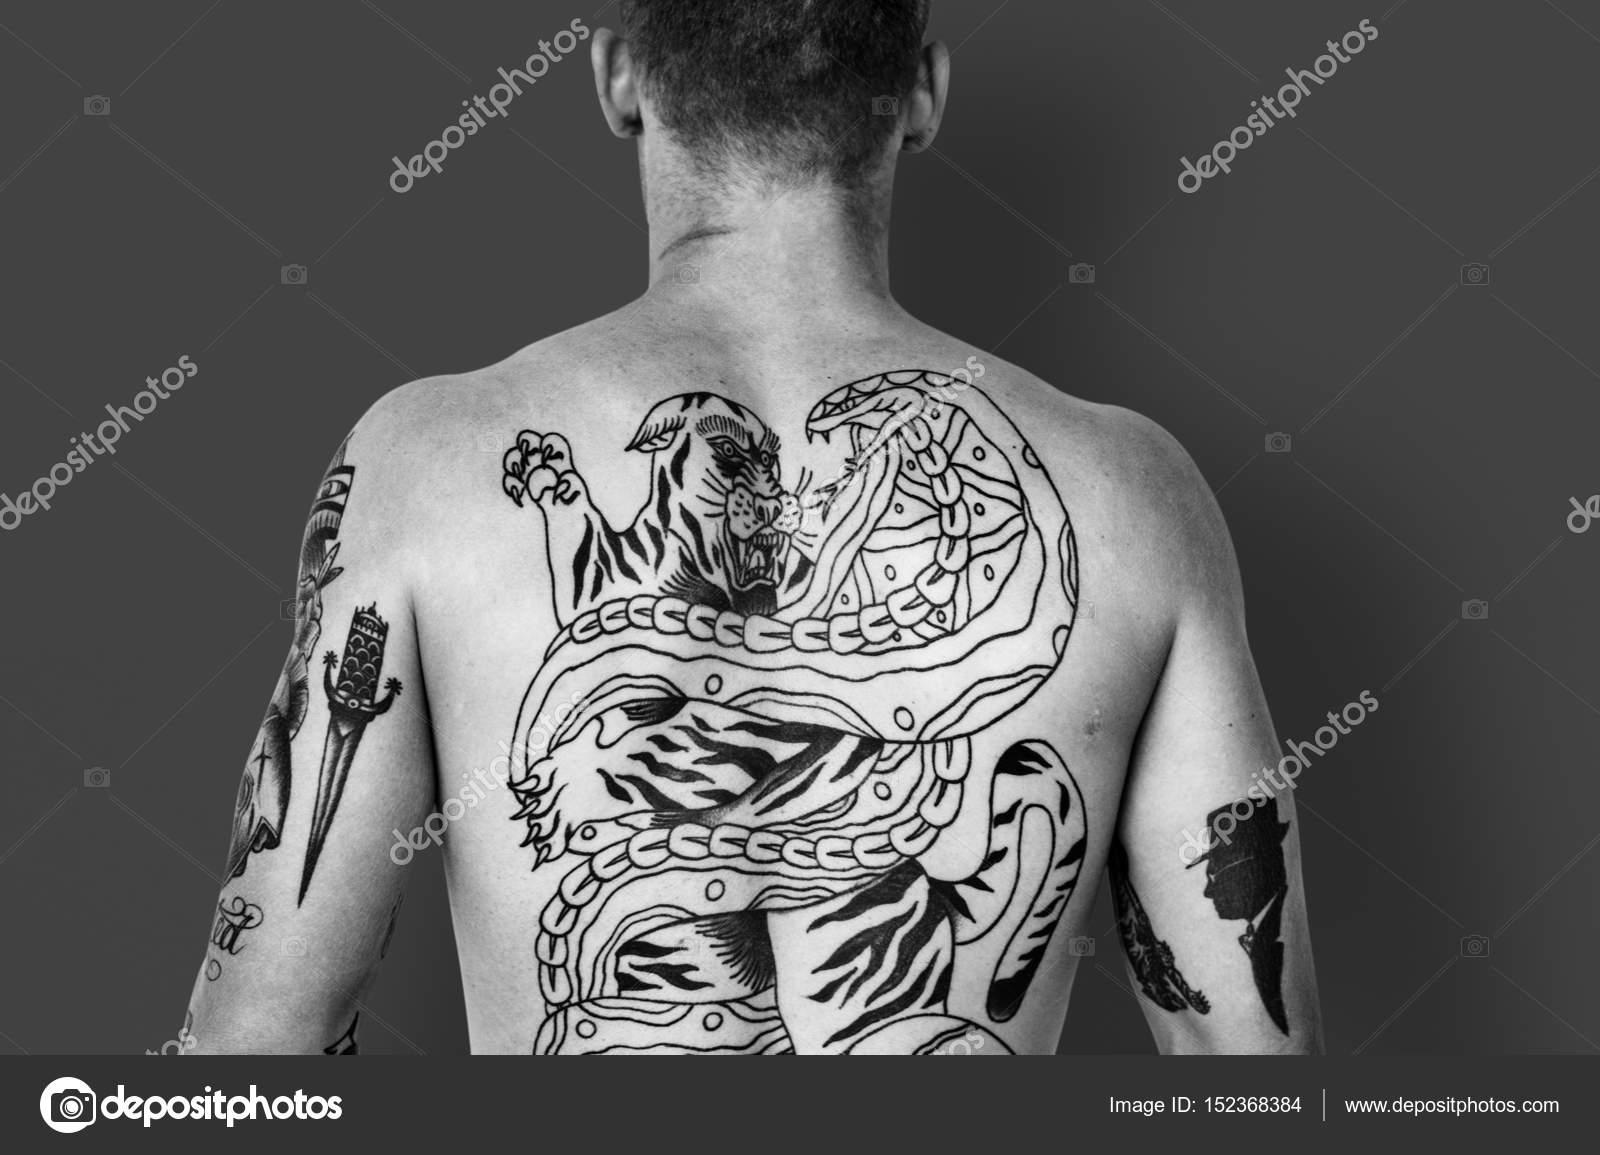 Can, too nakna tatuering flickor the same